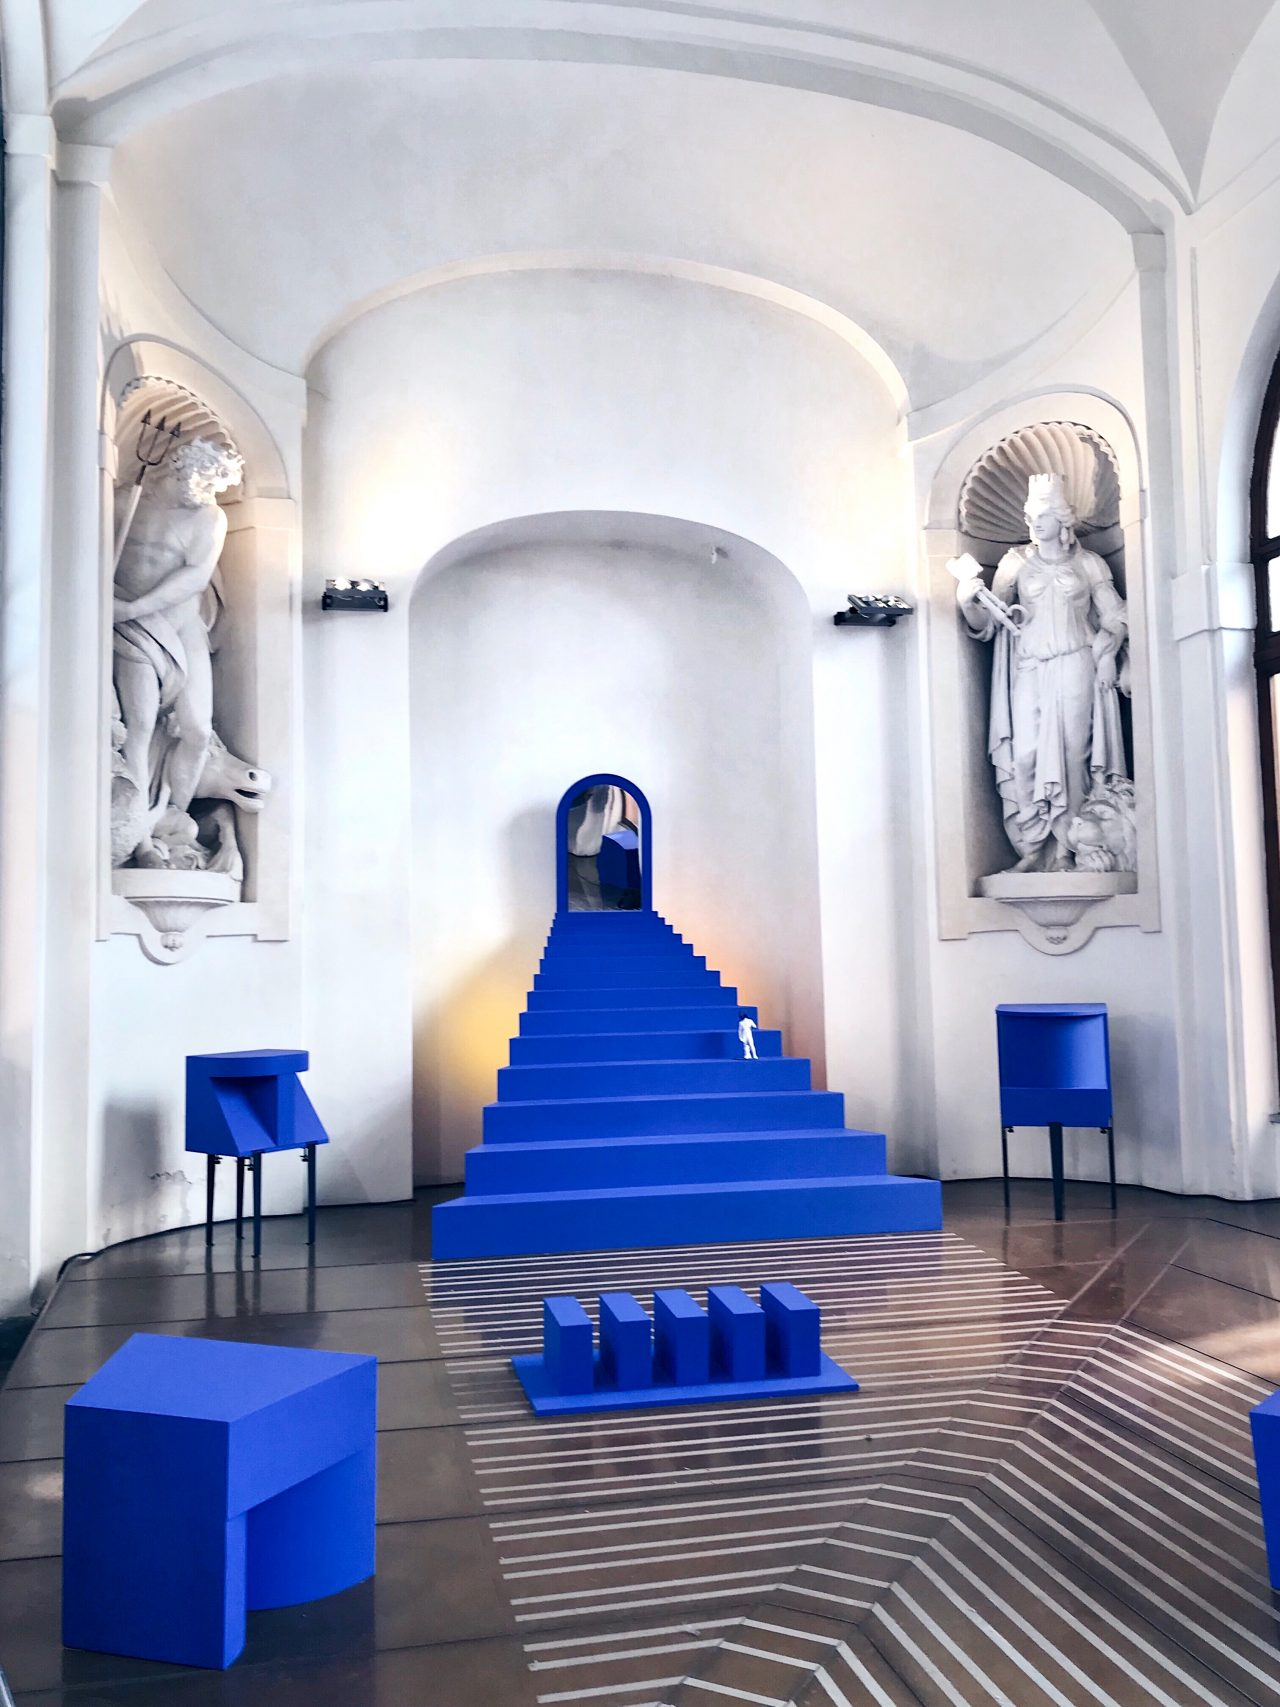 Ecole Camondo The Litta Varations Milan Design Week 2019